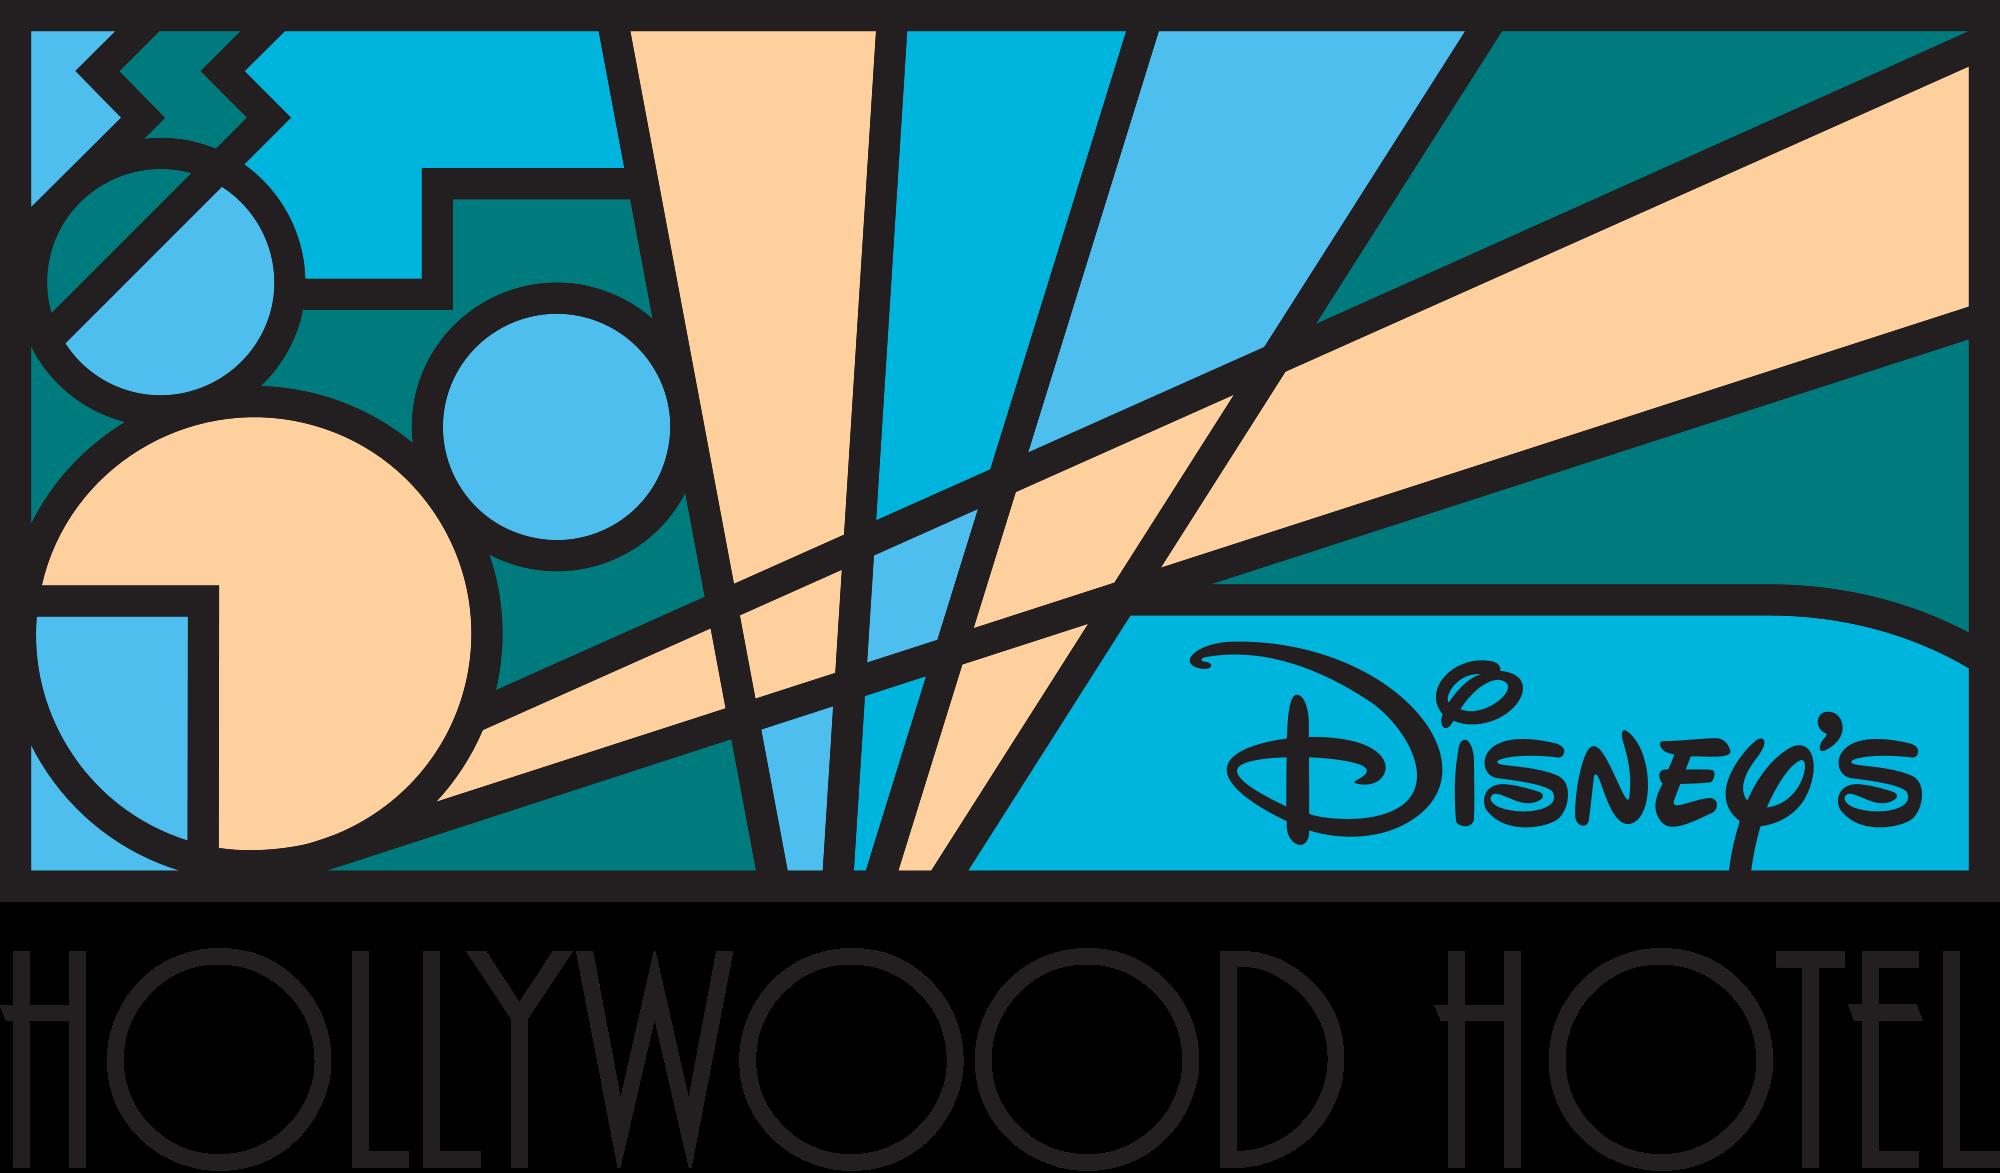 Disney S Hollywood Hotel Hollywood Hotel Disneyland Resort Hong Kong Disneyland